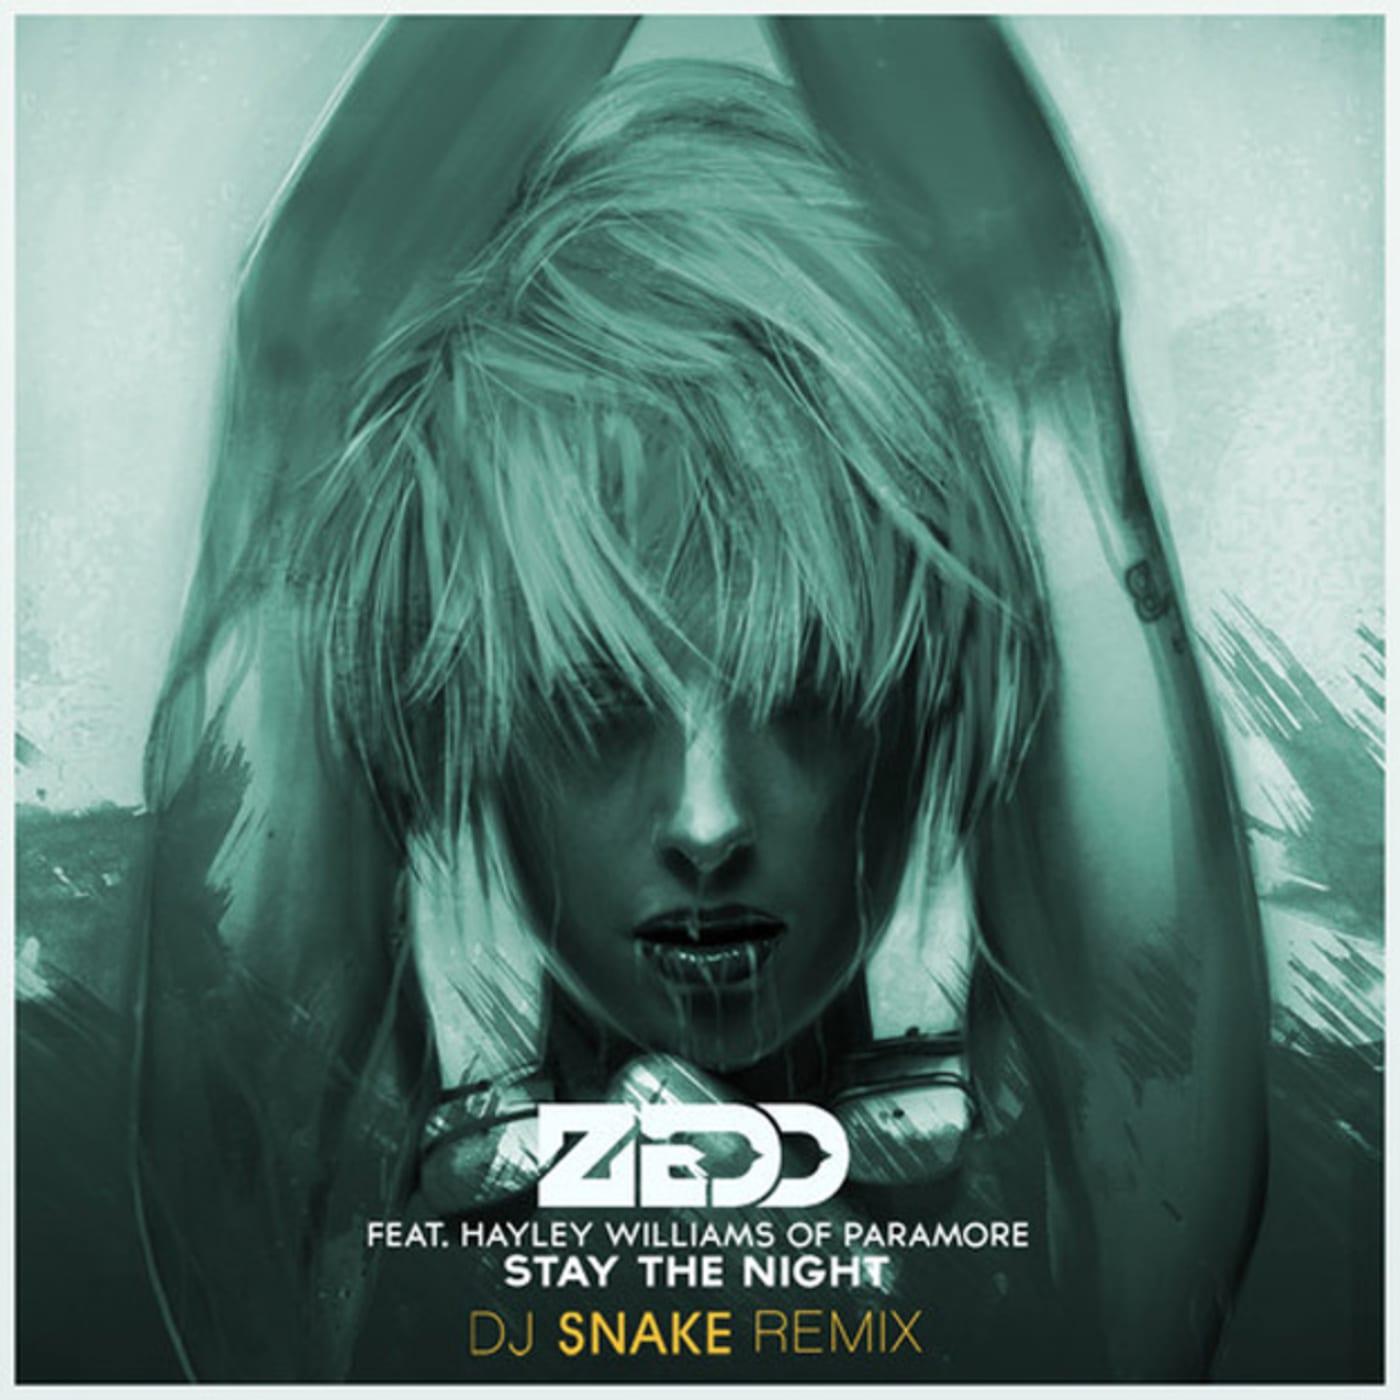 zedd stay the night dj snake remix